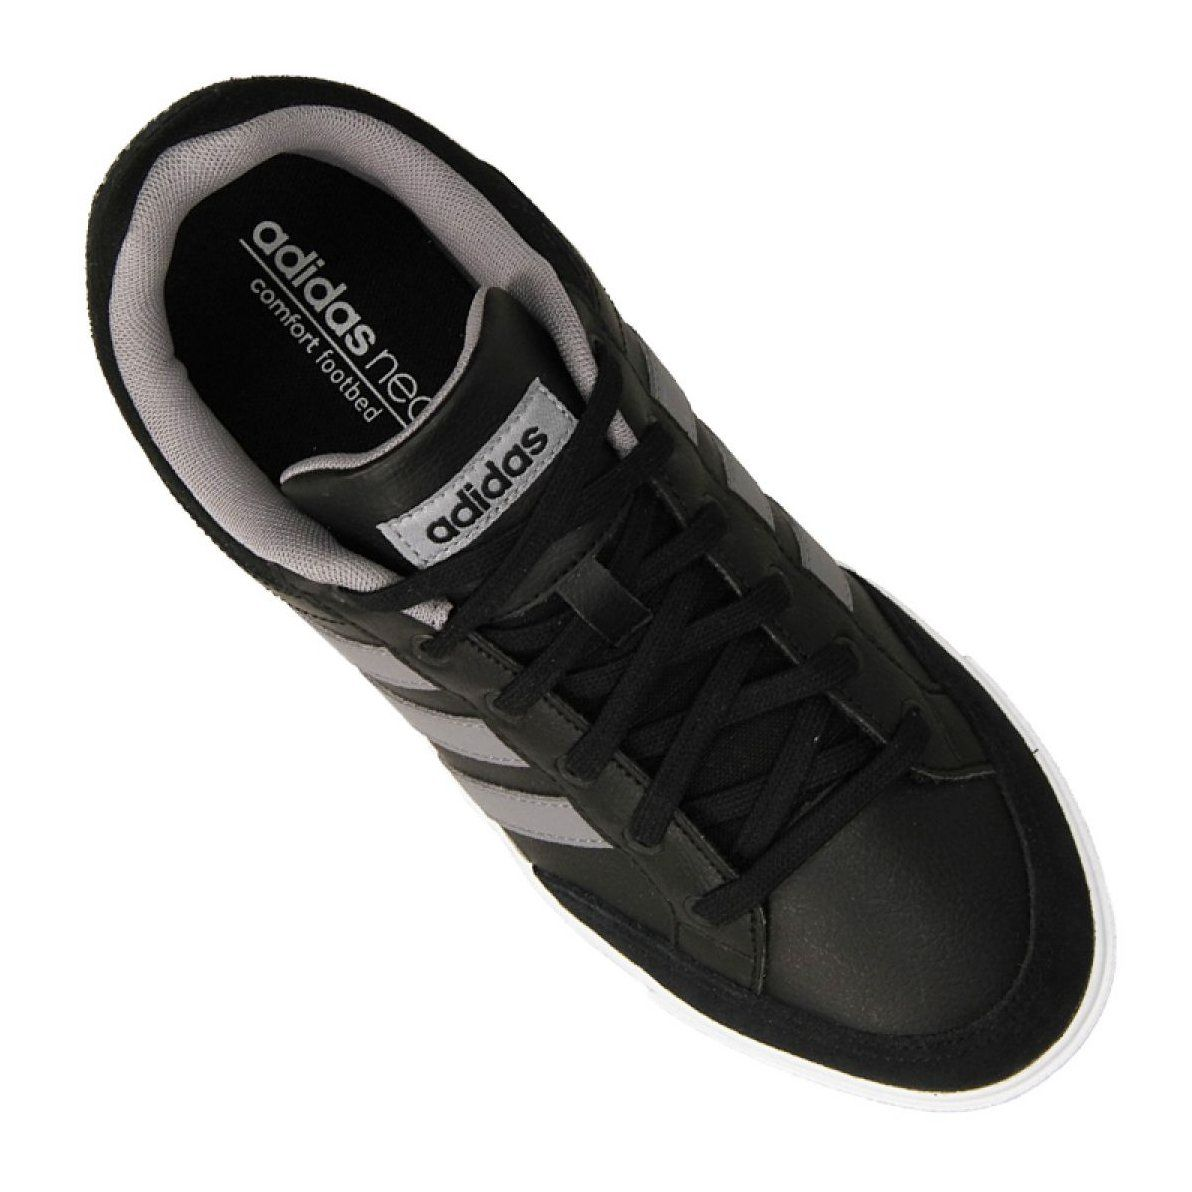 Buty Adidas Cacity M Bb9695 Czarne Black Shoes Shoes Adidas